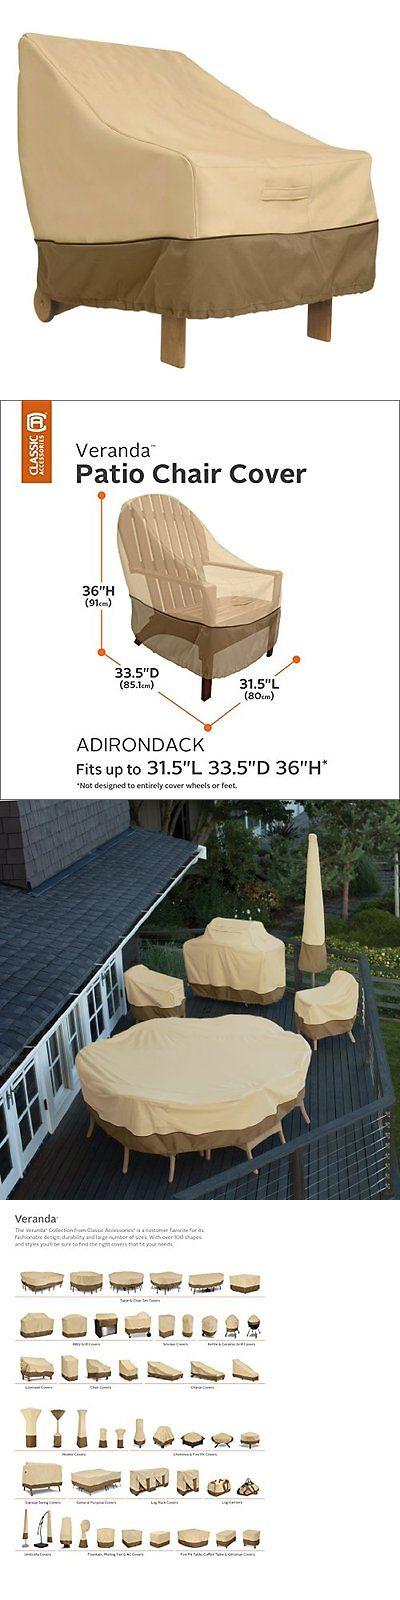 Outdoor Furniture Covers 177031 Classic Accessories Veranda